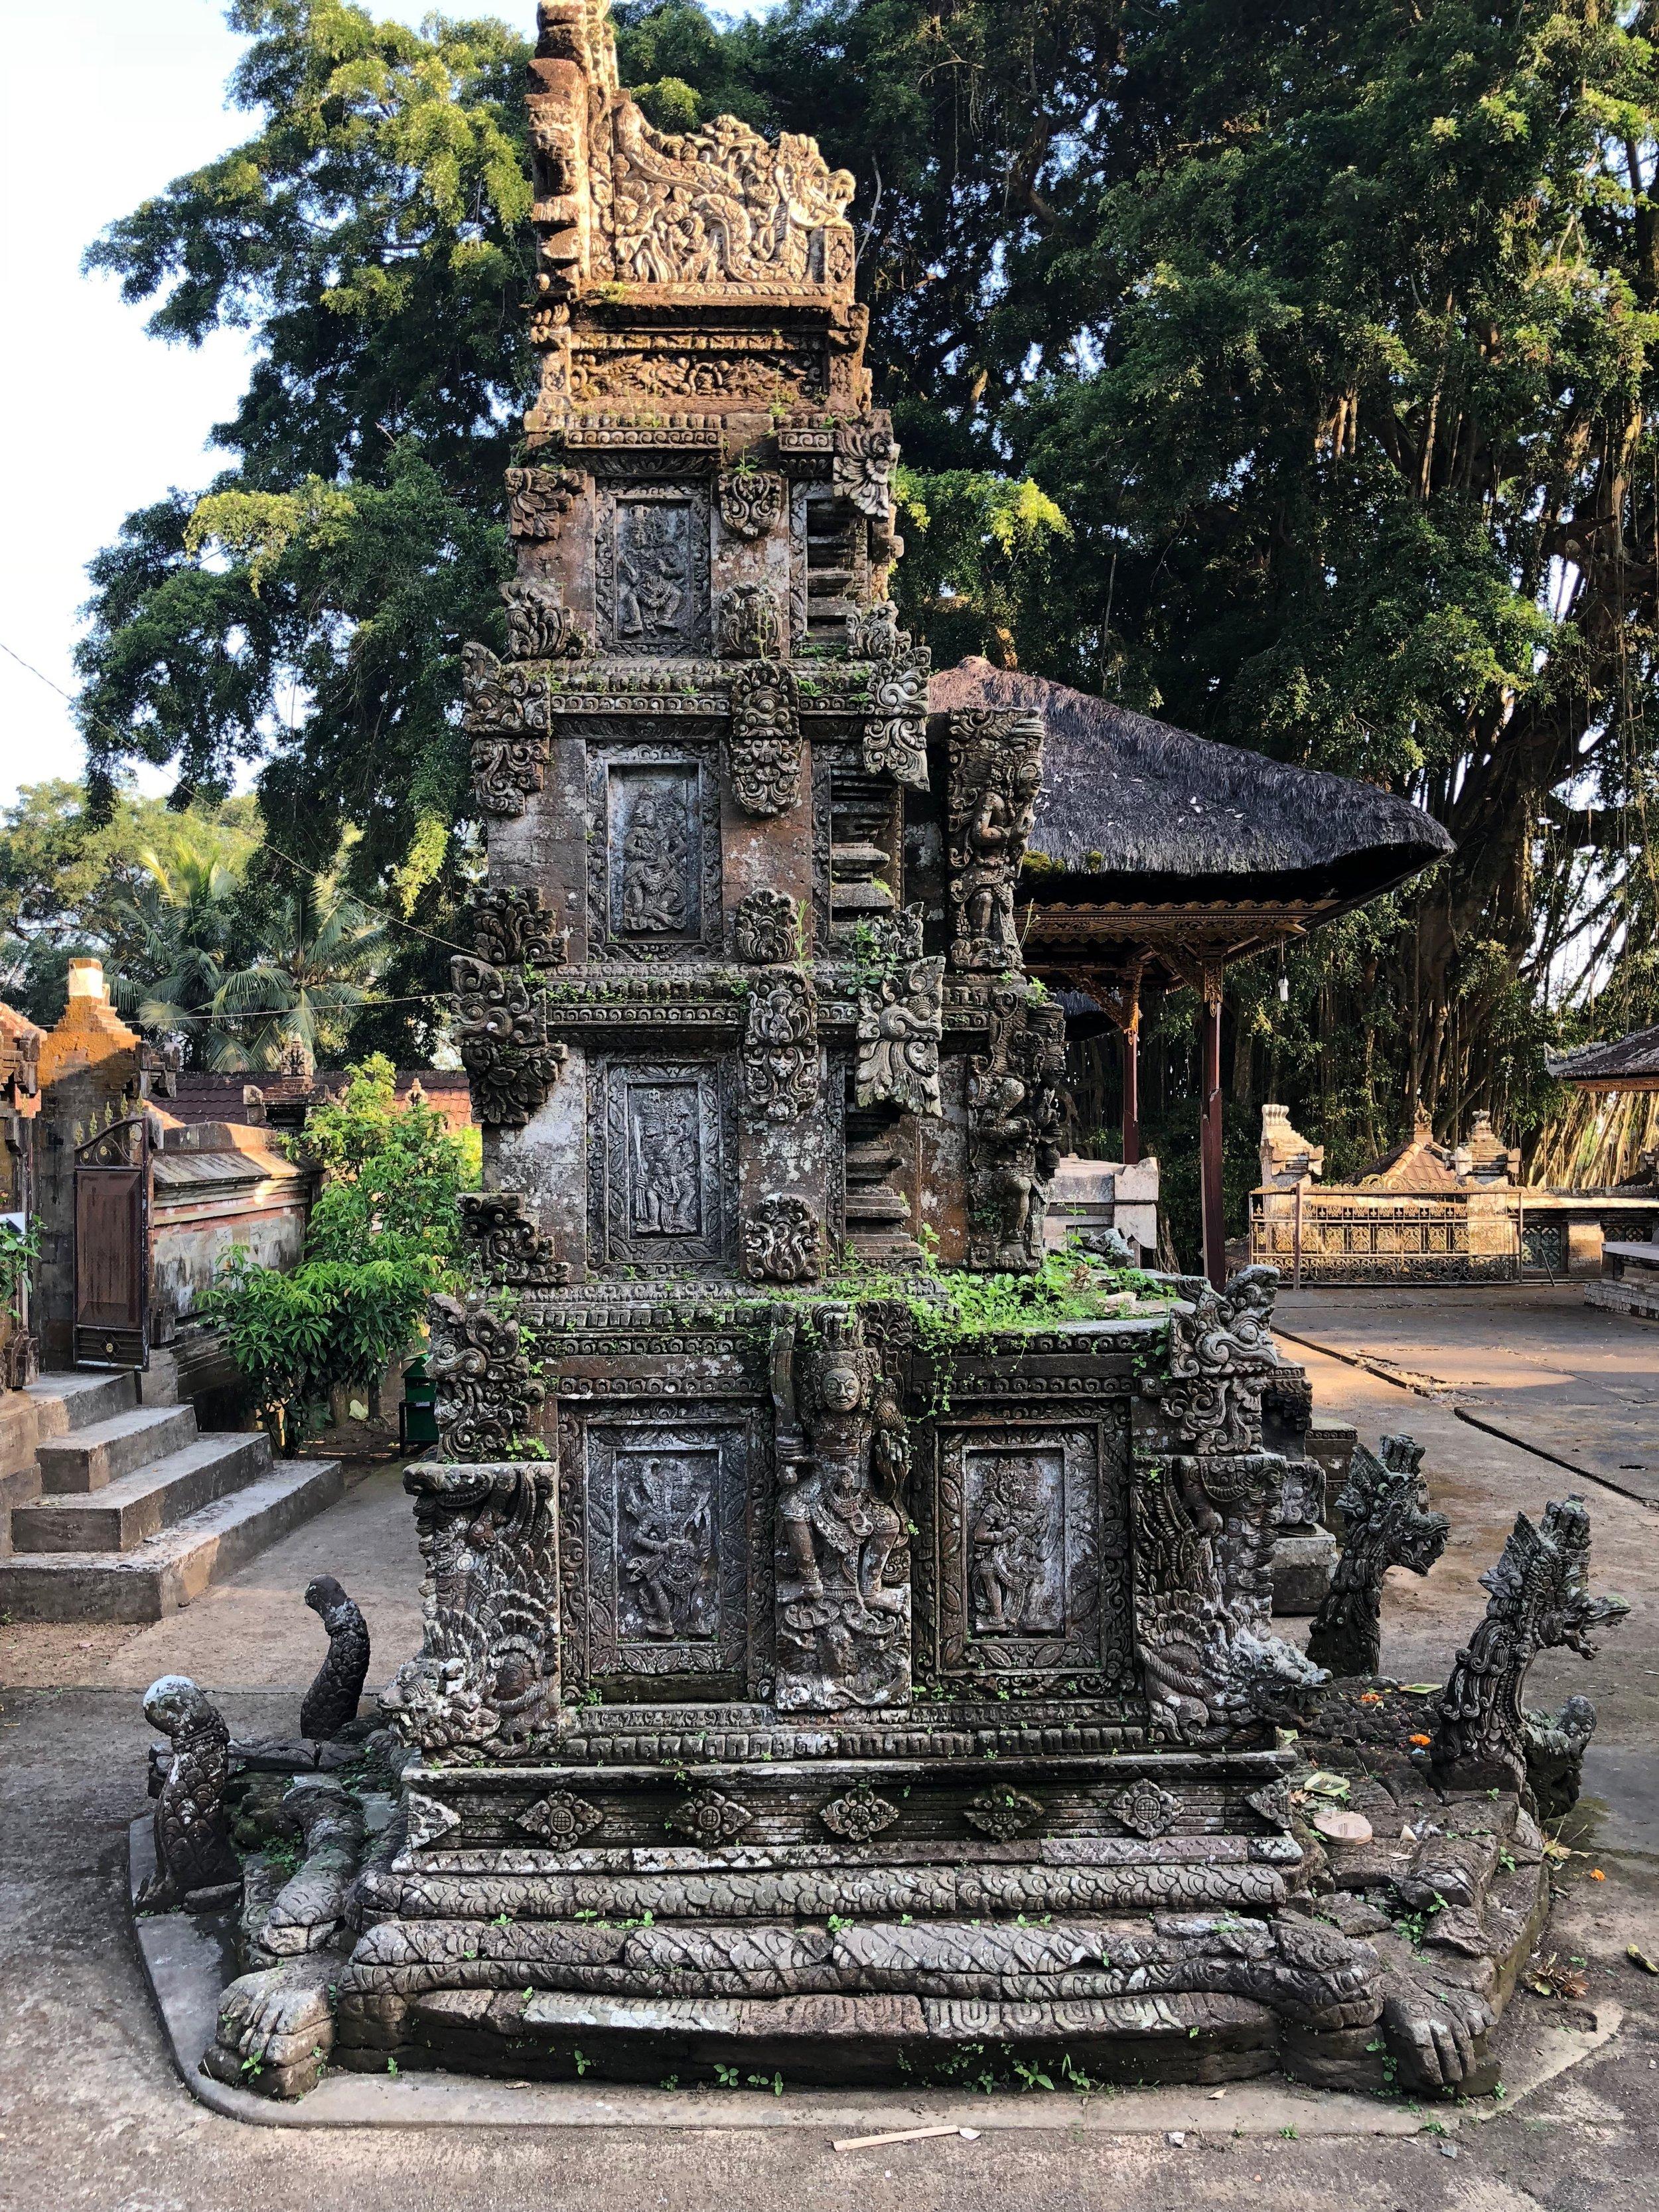 This intricately carved padmasana shrine, or lotus throne, is dedicated to the Hindu trinity of Brahma, Vishnu and Shiva